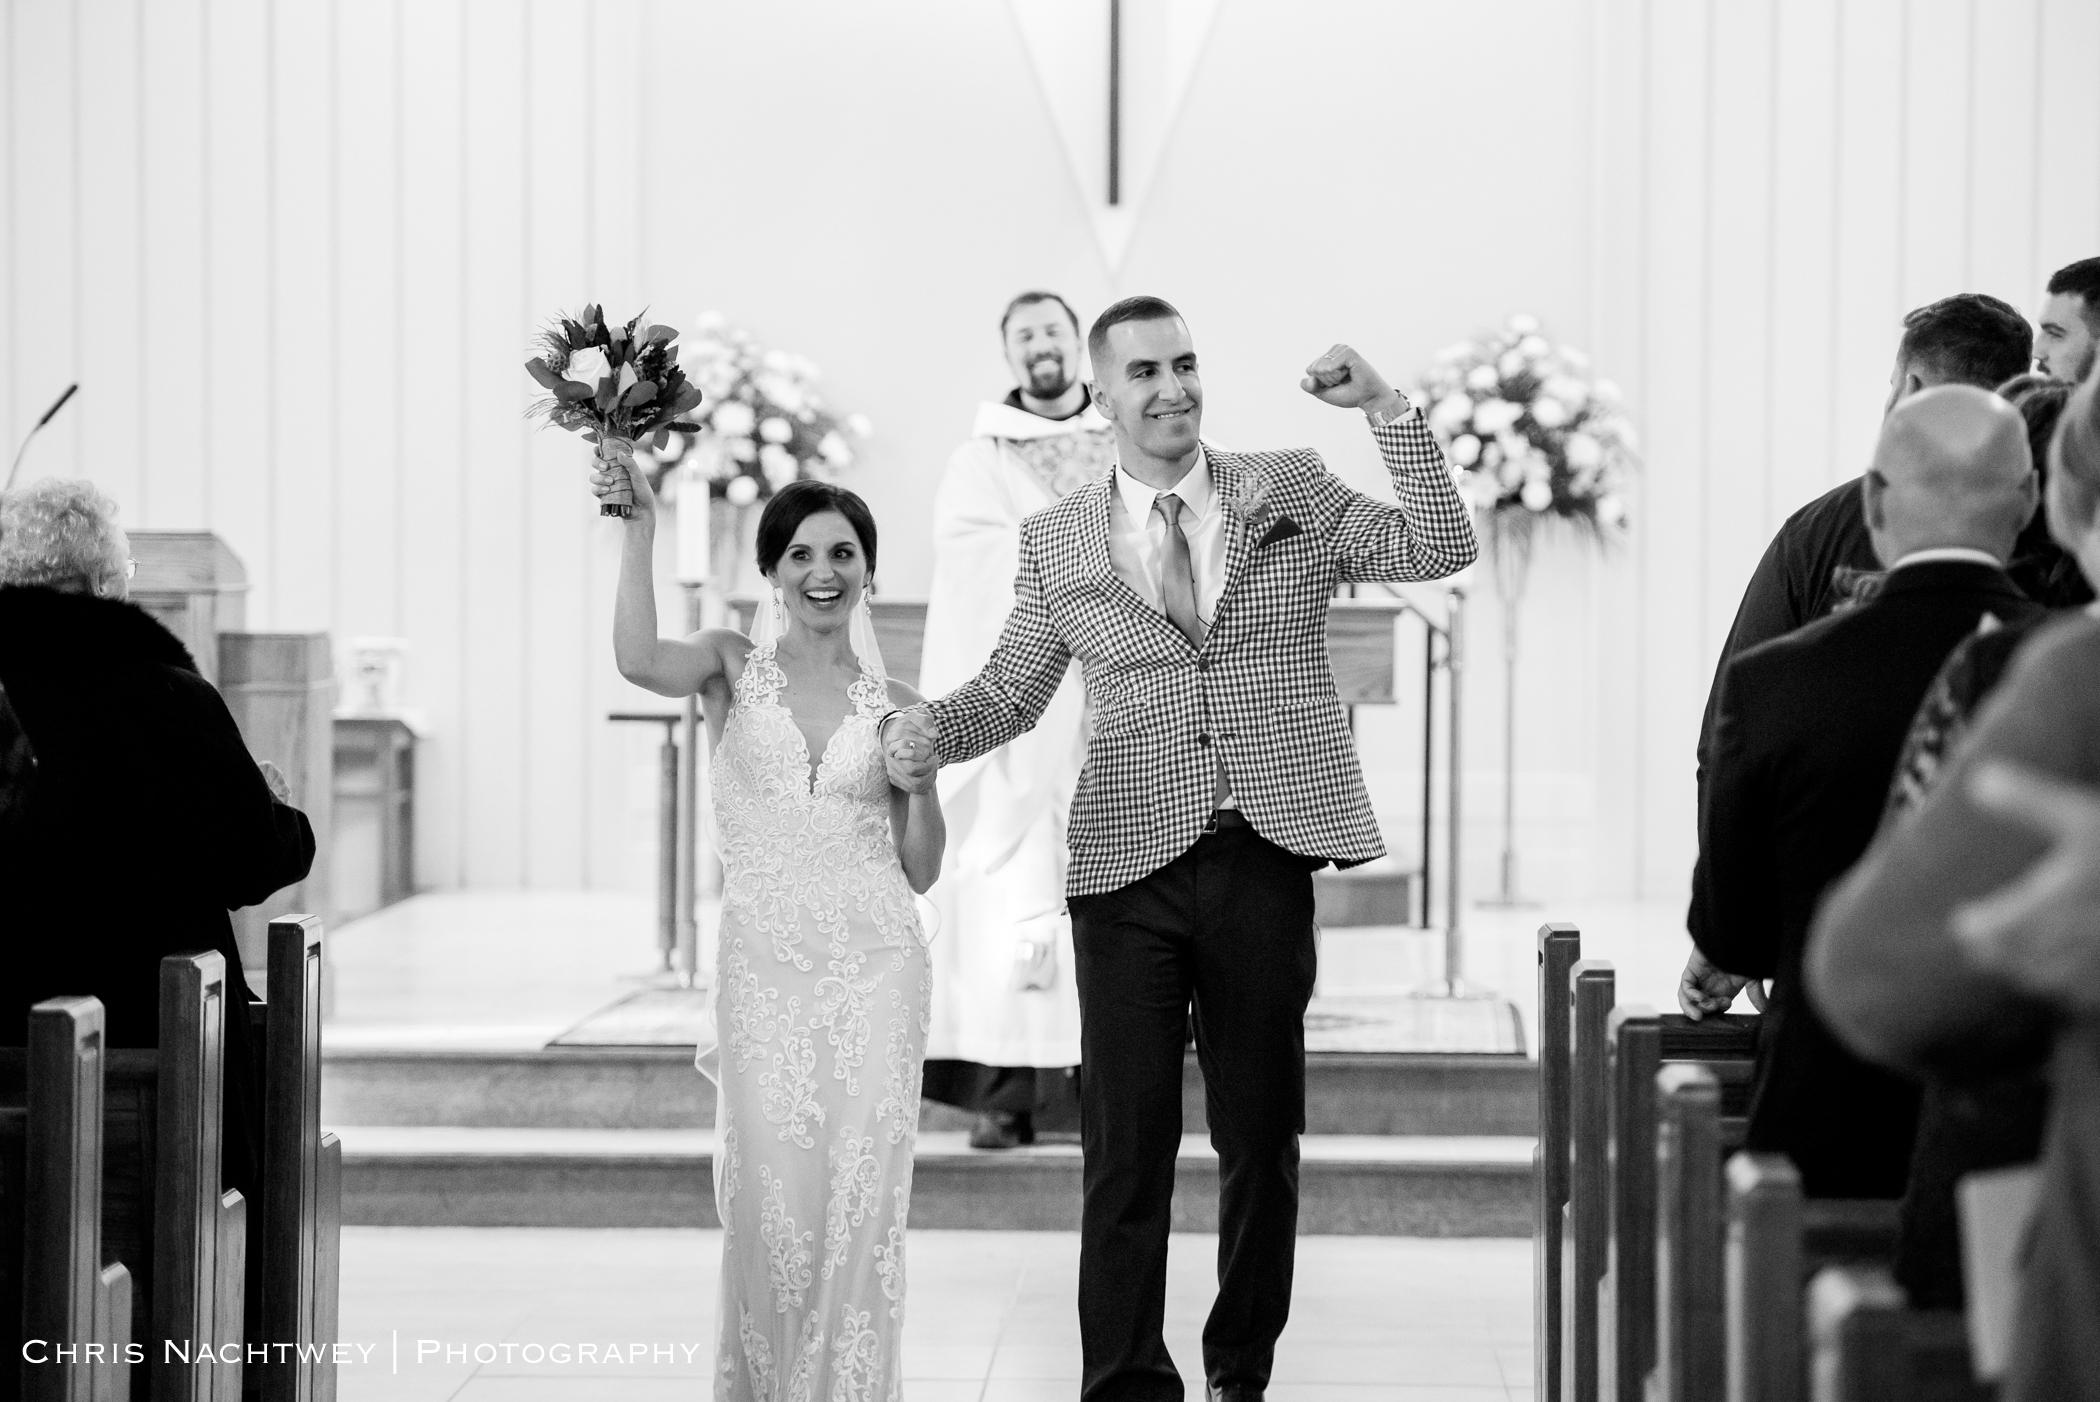 artistic-ct-wedding-photographers-chris-nachtwey-2017-3.jpg